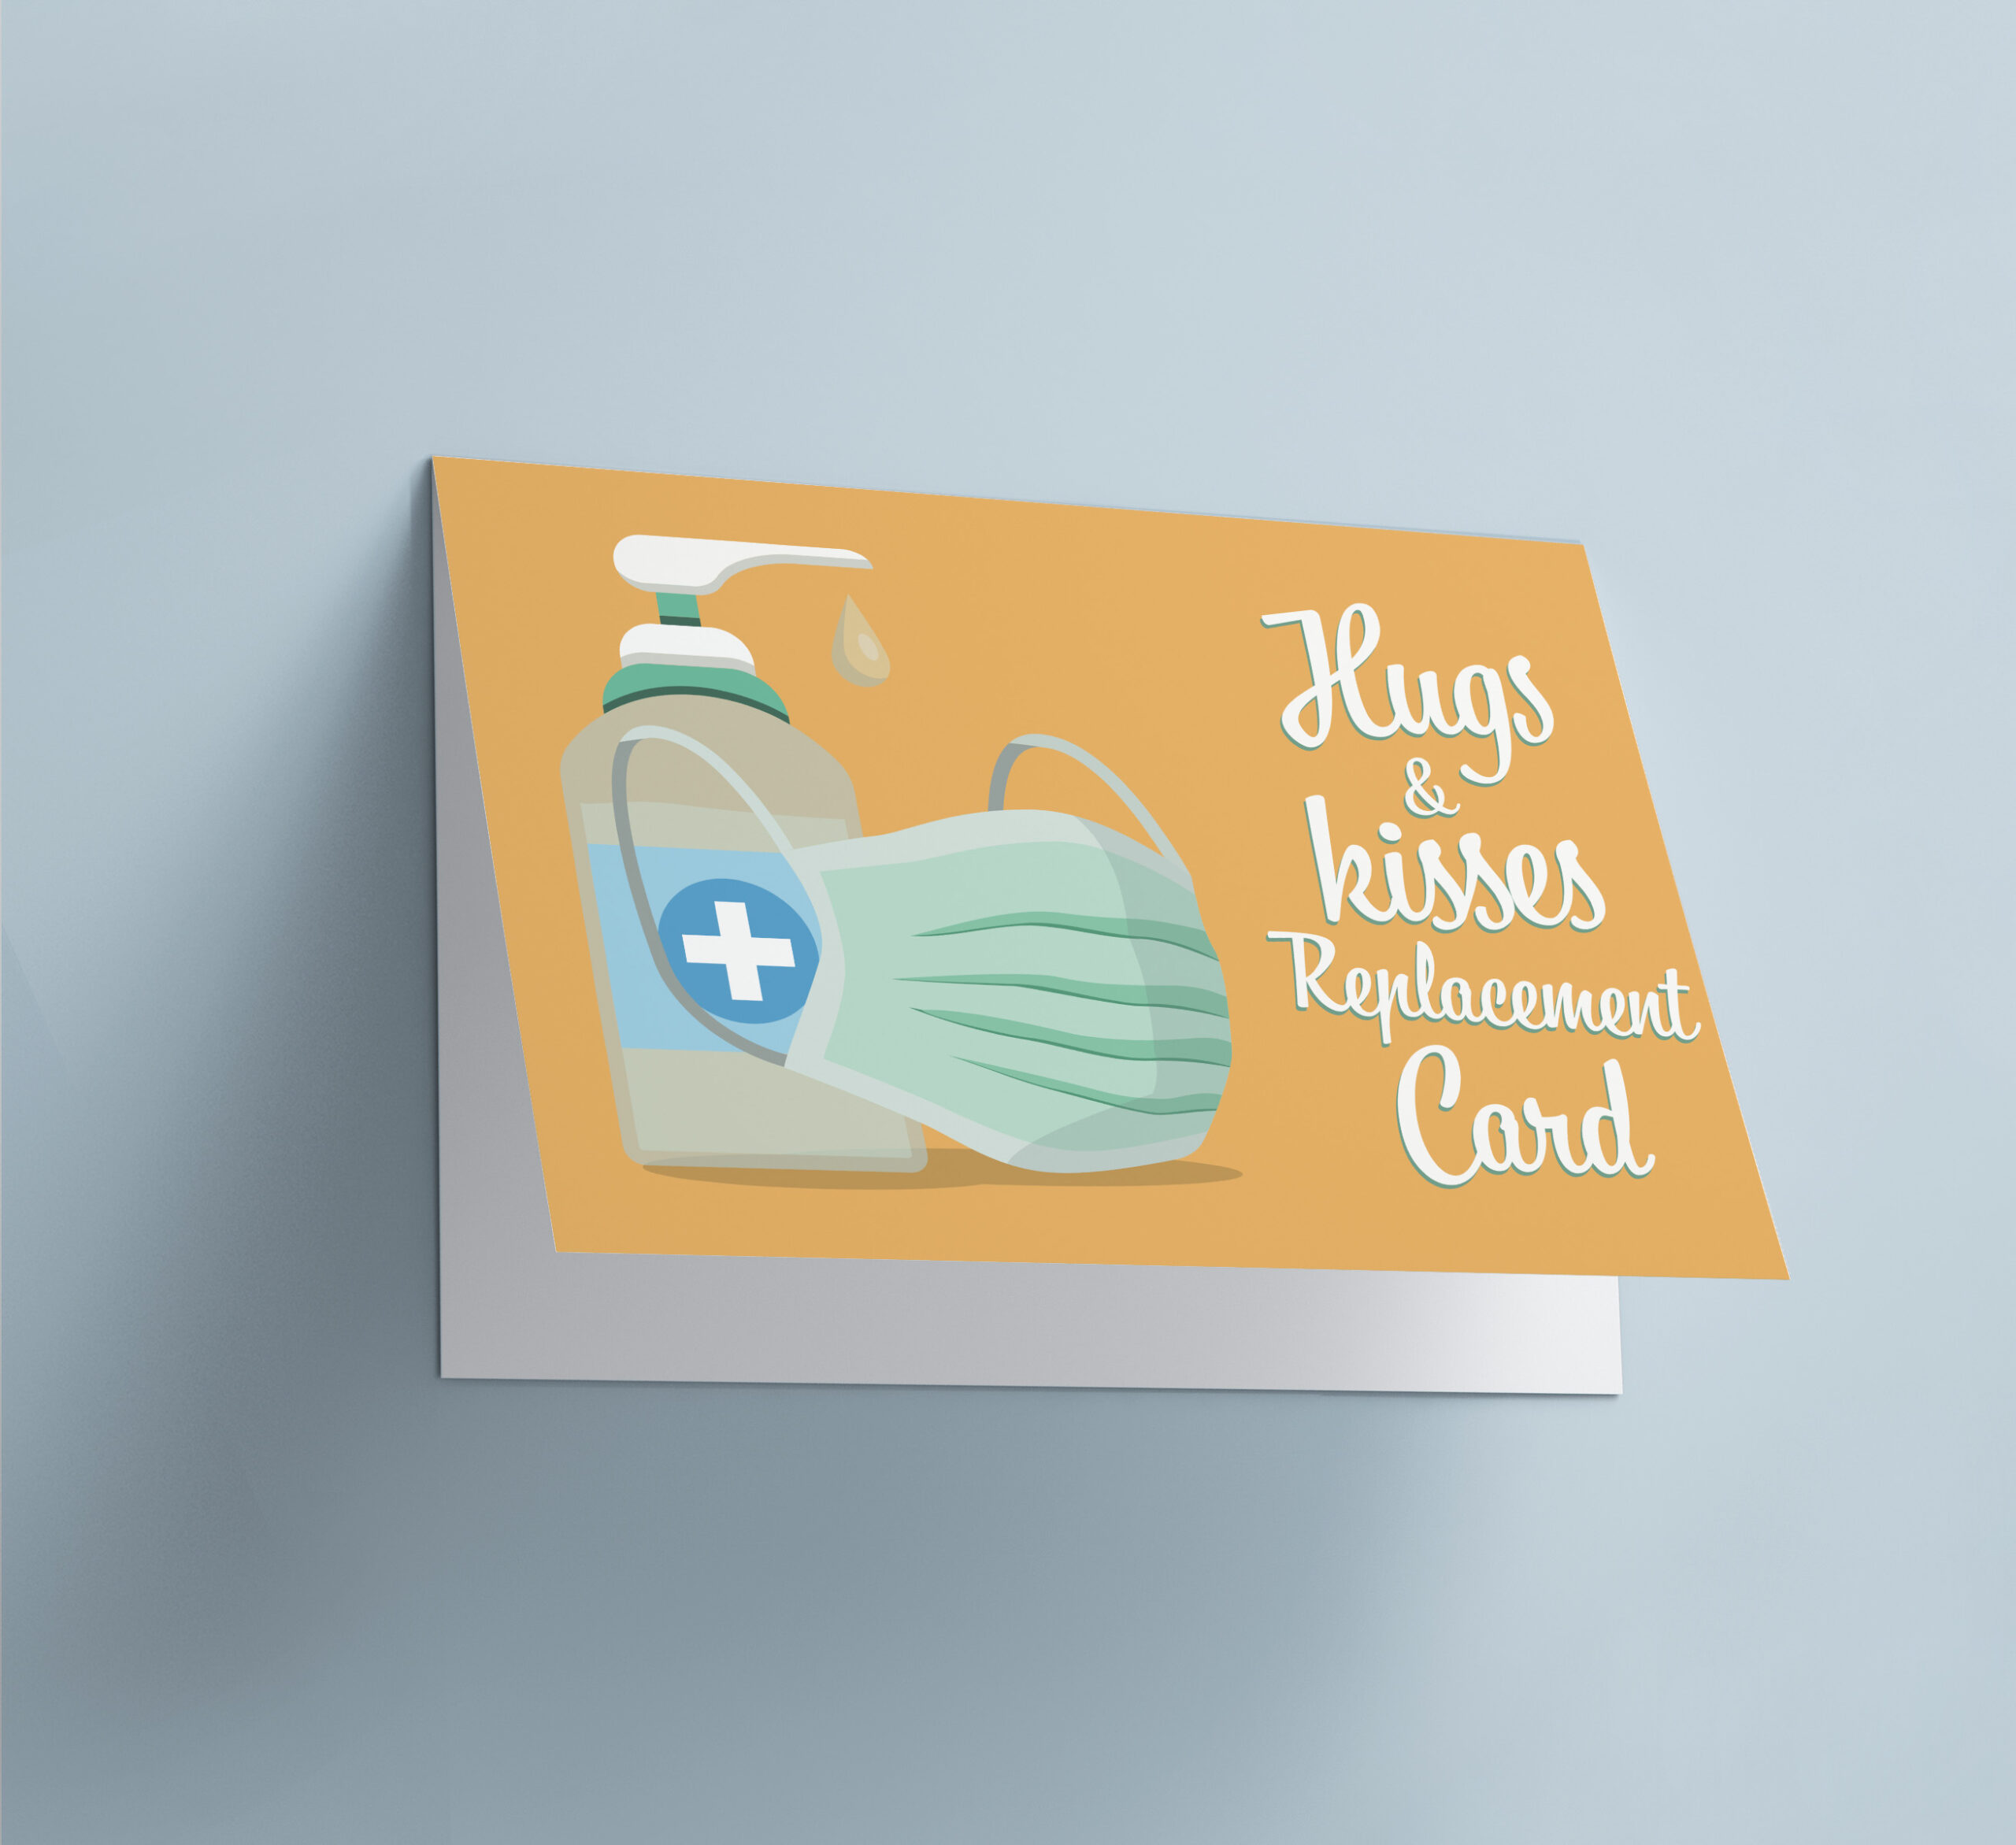 Hugs & Kisses Replacement Card